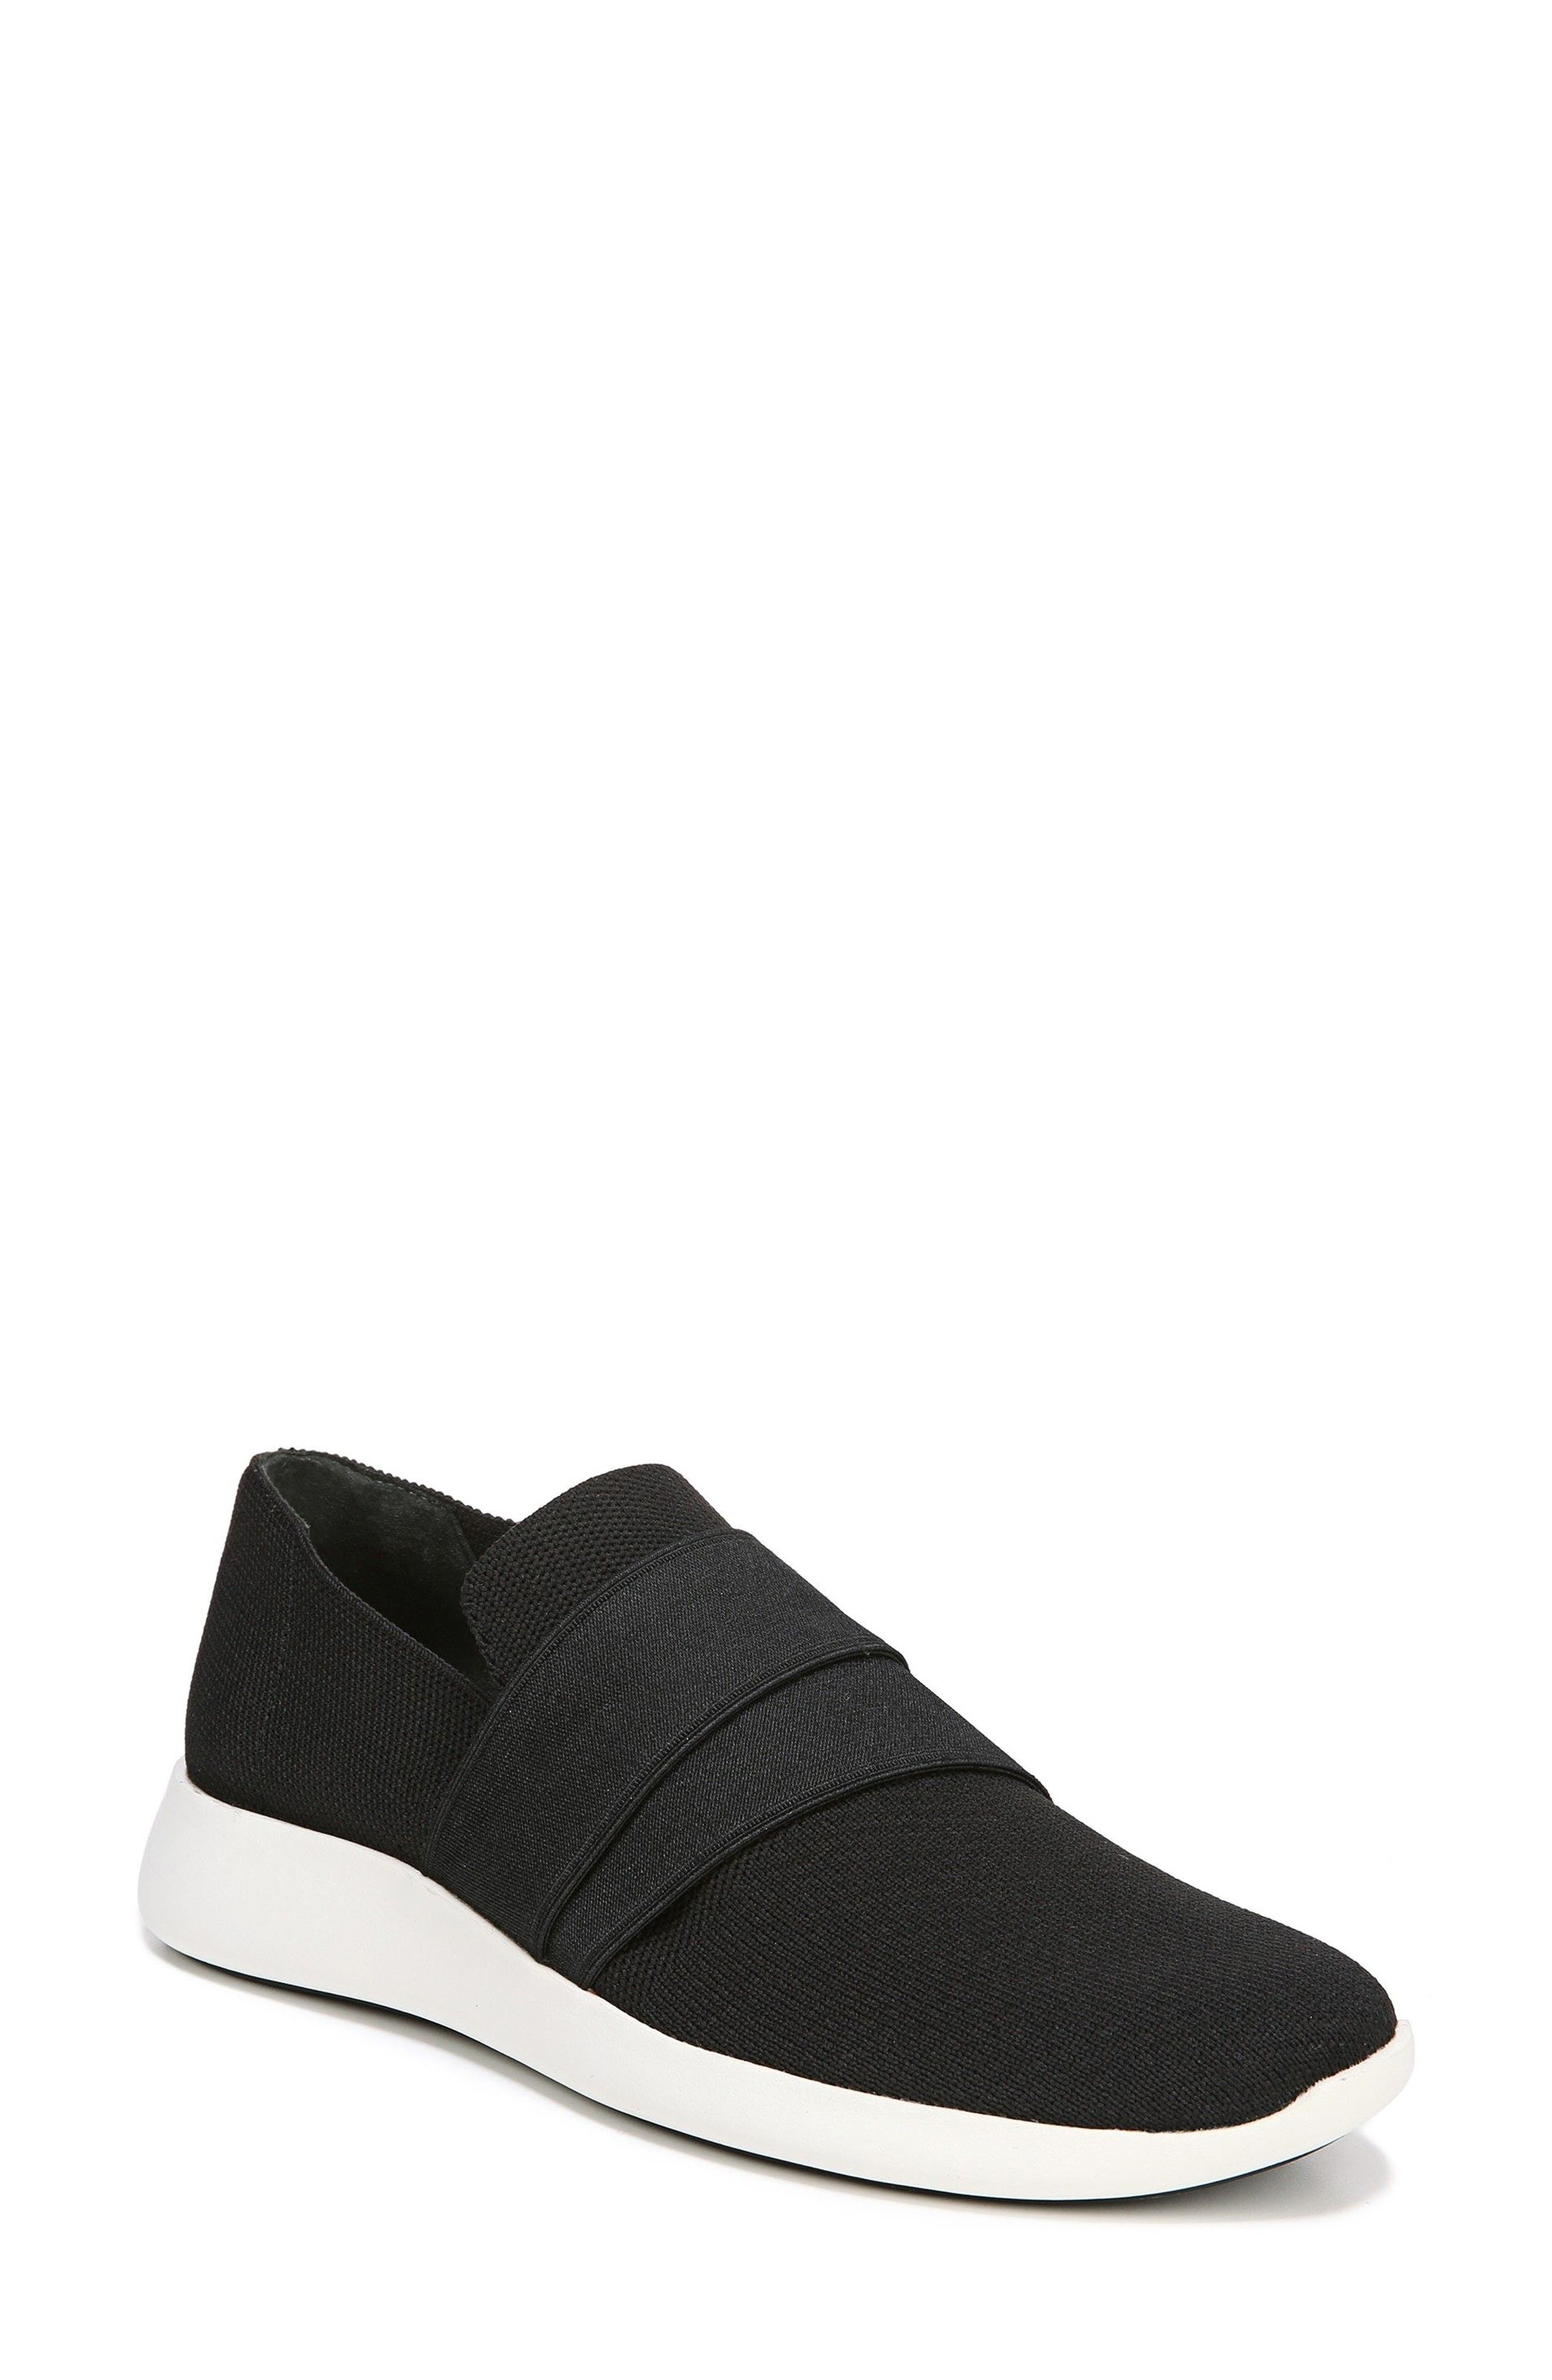 VINCE, Aston Slip-On Sneaker, Main thumbnail 1, color, BLACK SOLID KNIT